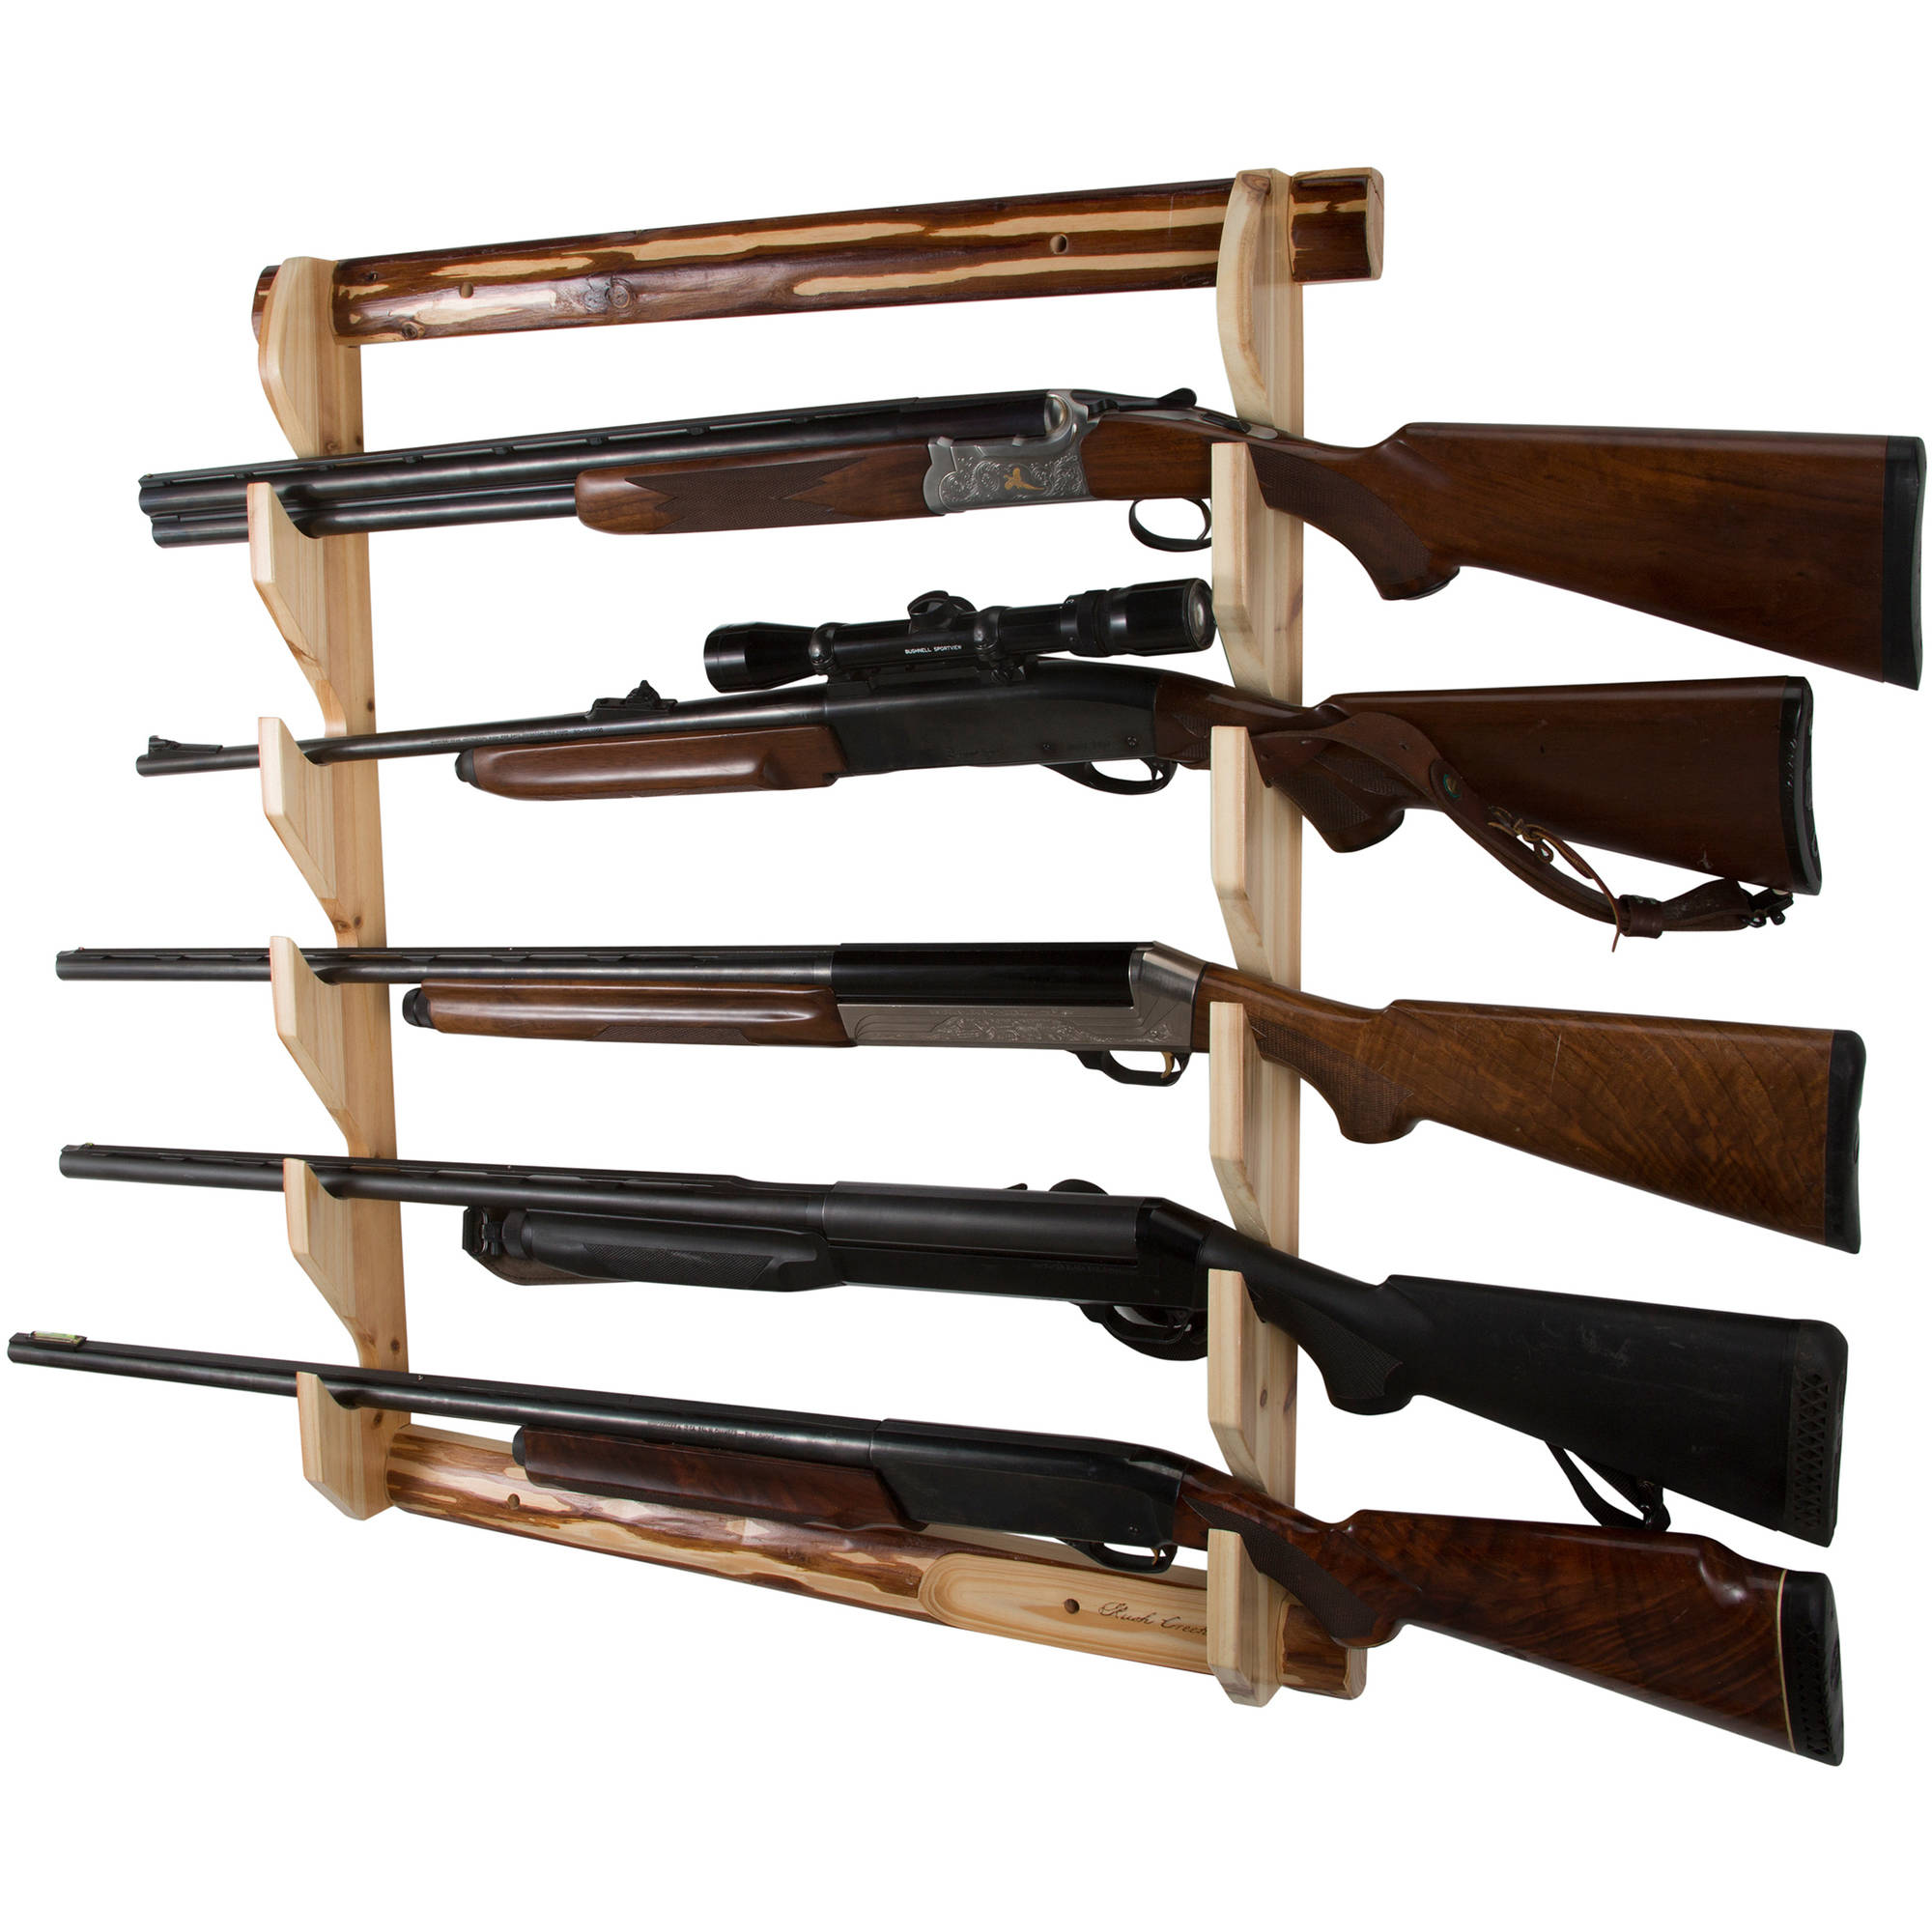 Rush Creek Creations 5 Gun Wall Storage Rack by Rush Creek Creations